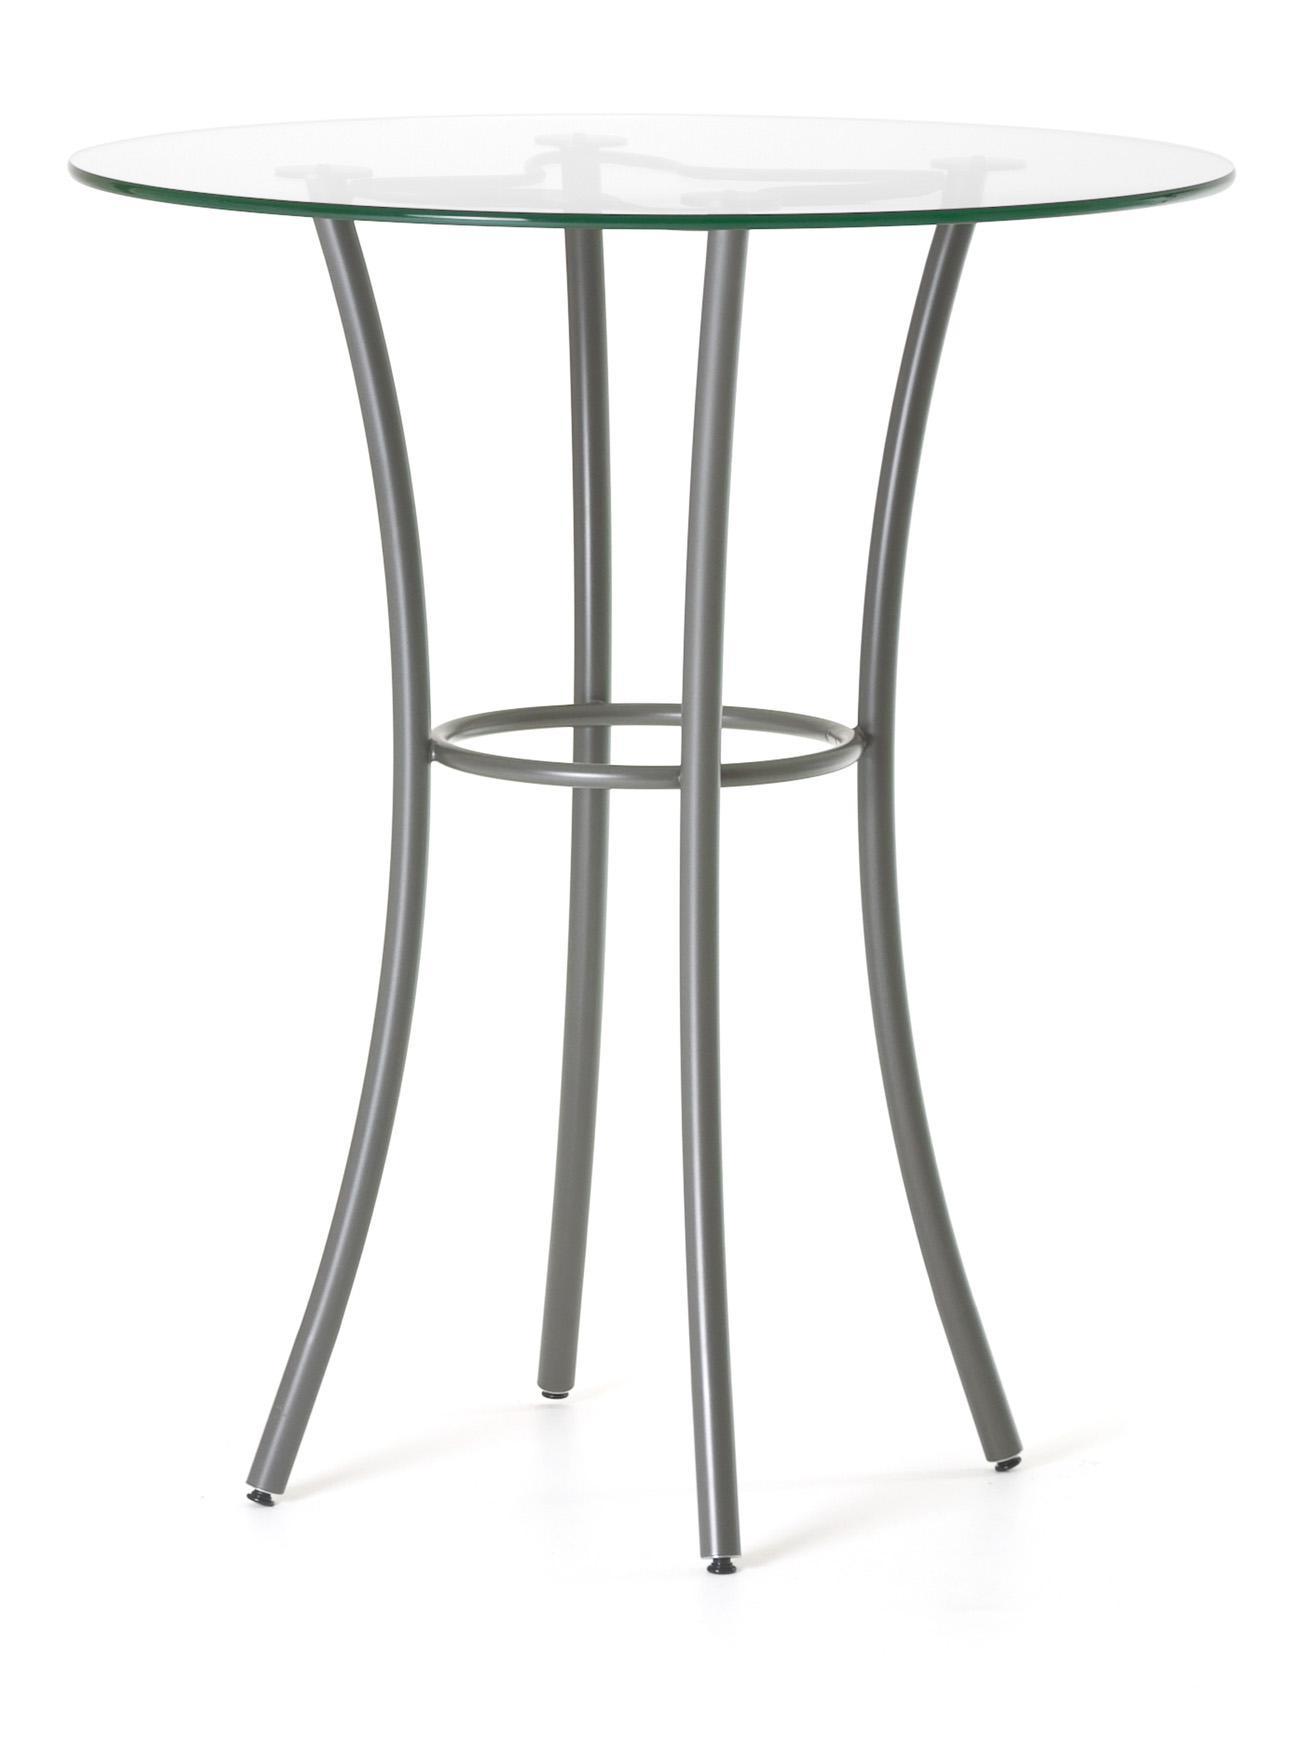 Superieur Amisco Tables AmiscoLotus Bar Height Table